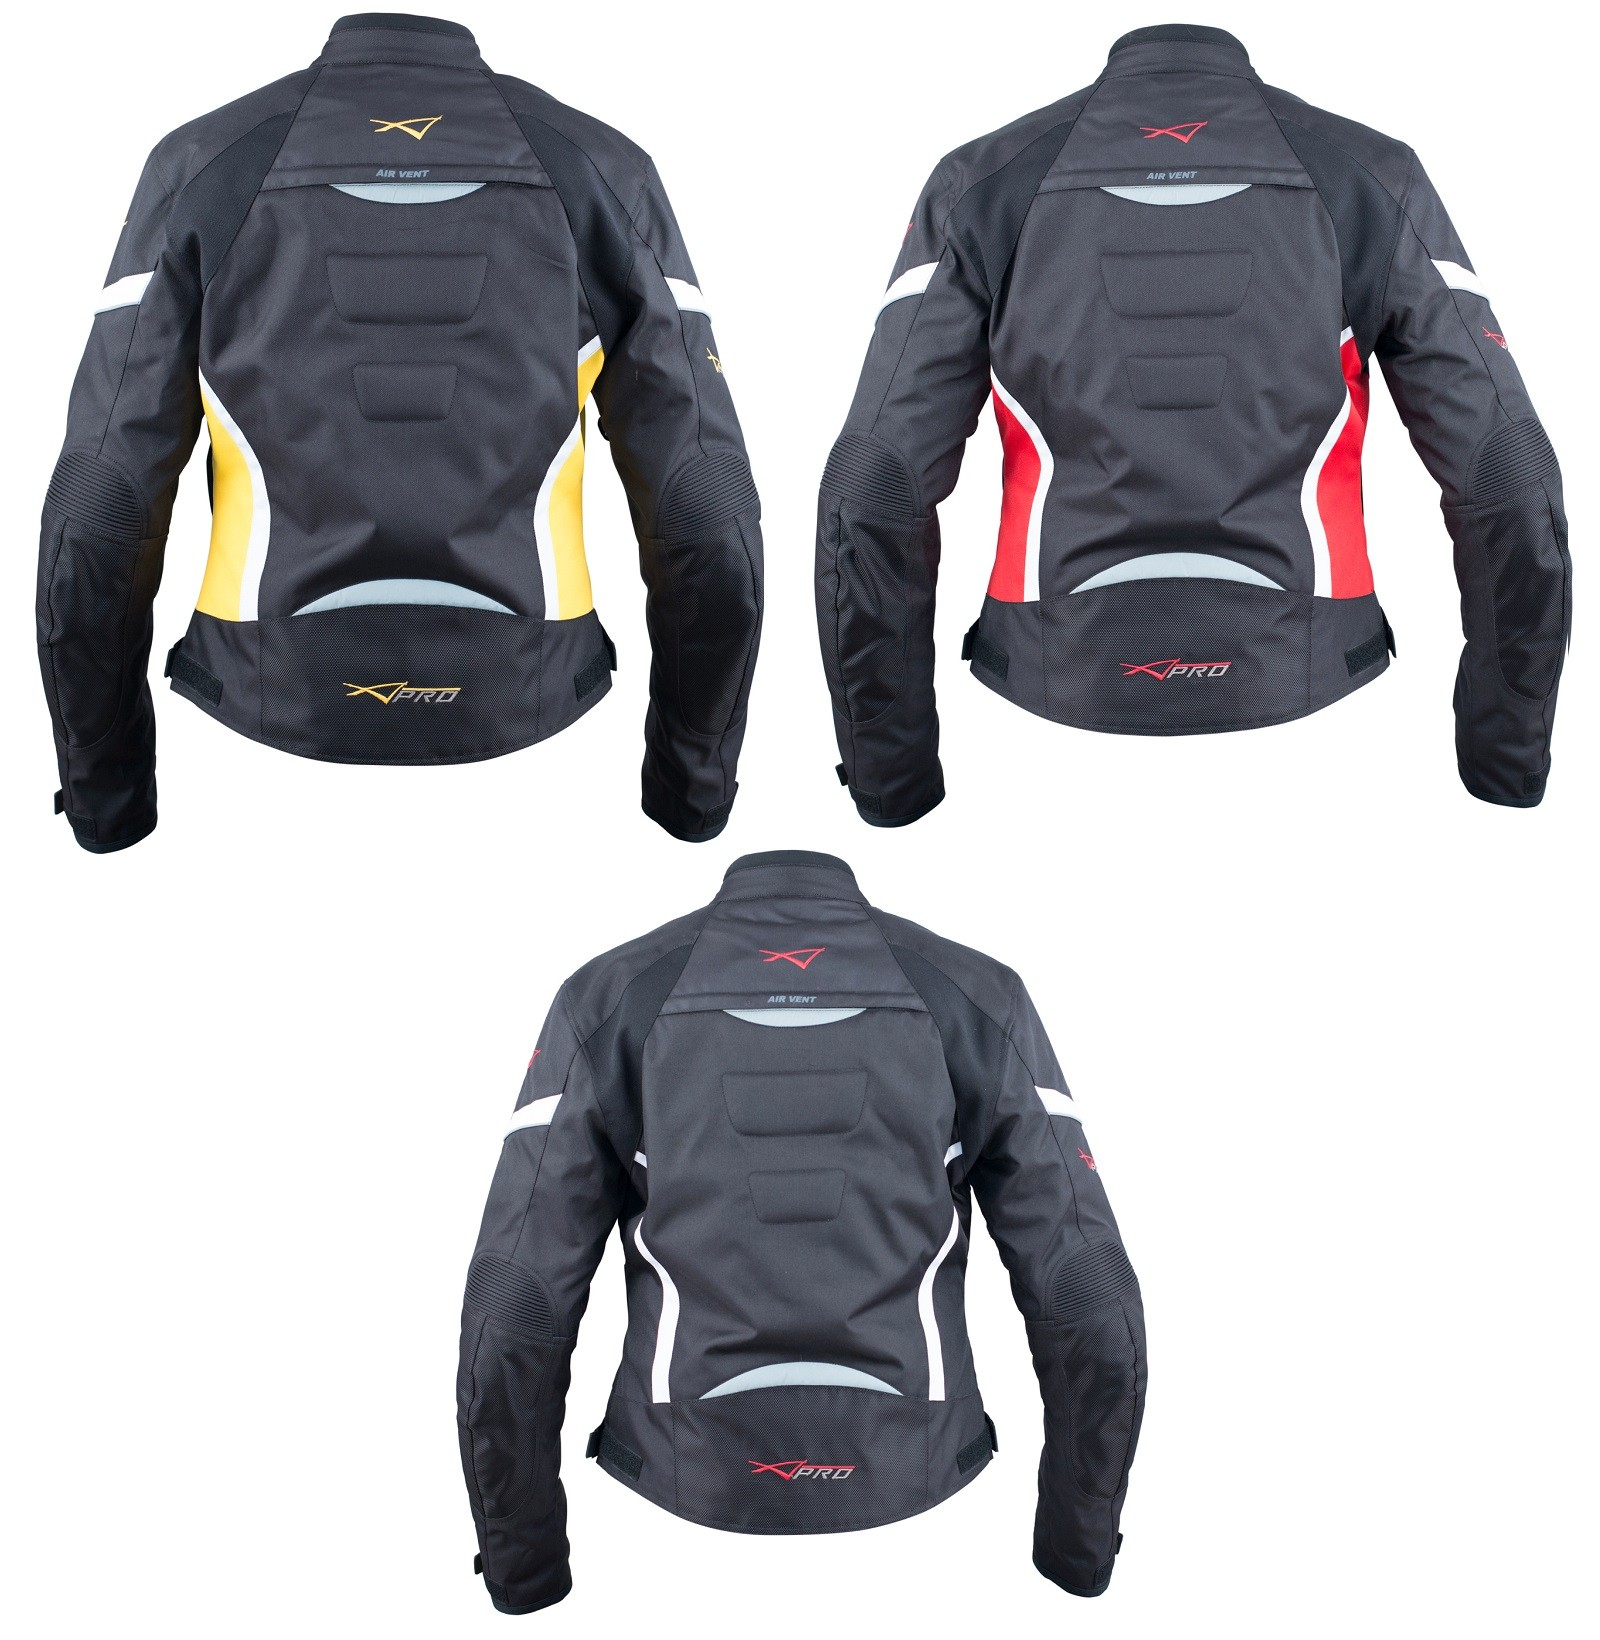 Moto Giacca Donna Sport Impermeabile Tessuto Riflettente Fluo S